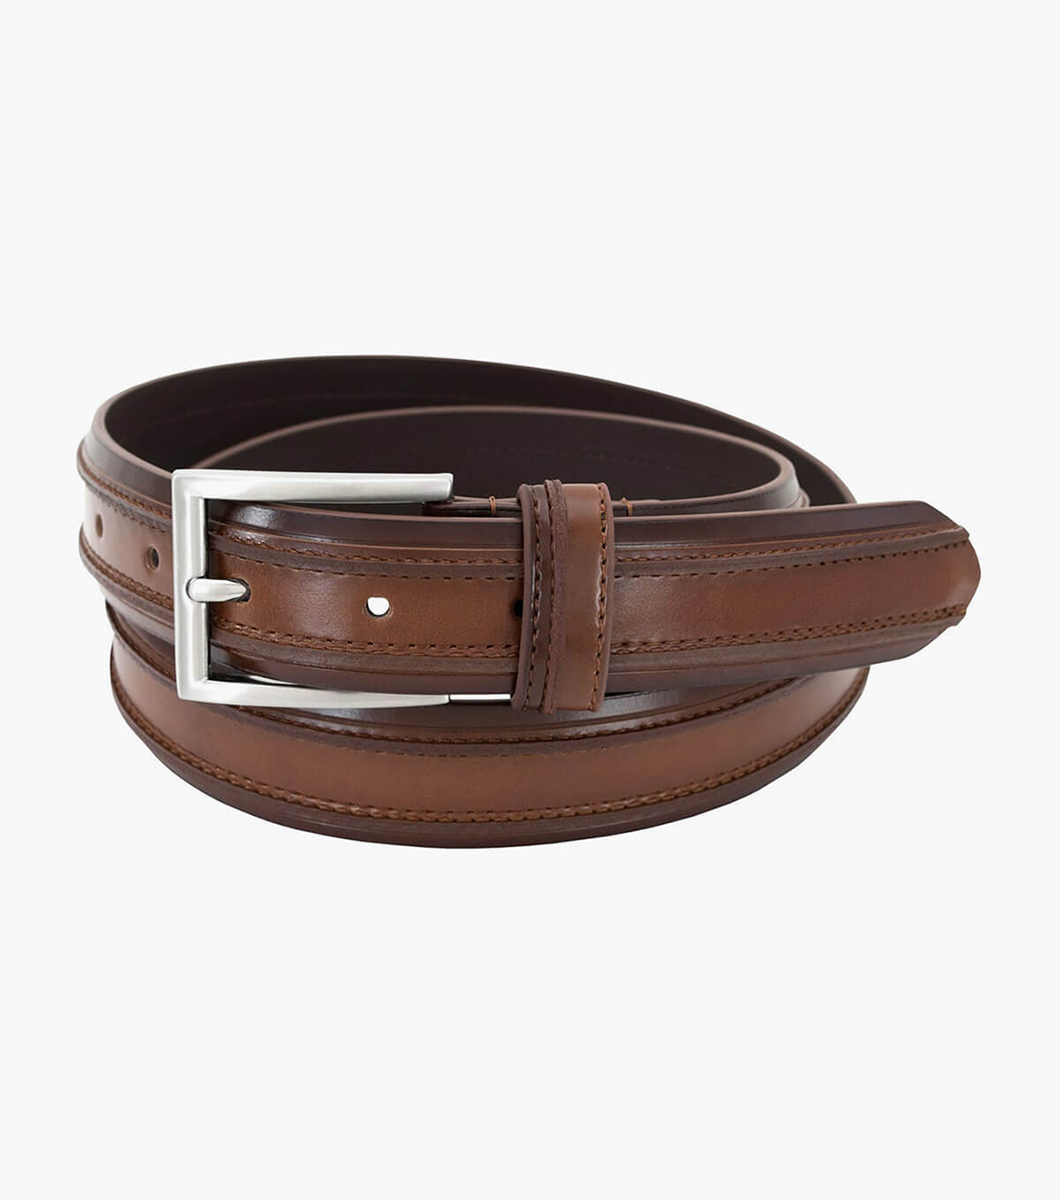 ebc36e70d0da Men s Belts